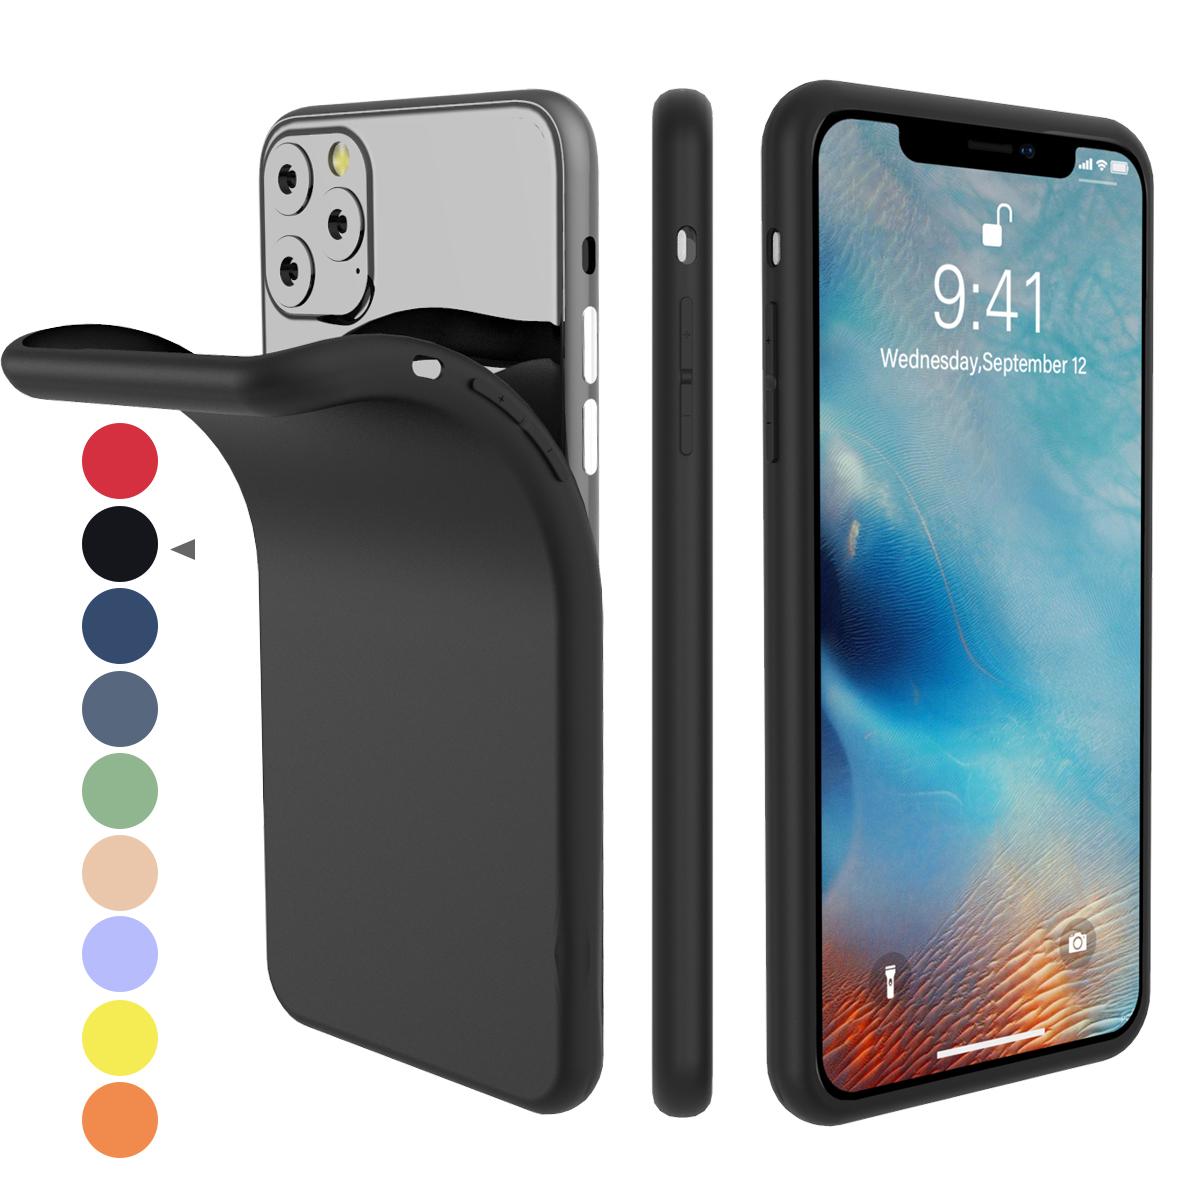 Torubia Silicone Case for iPhone 11/11 Pro/11 Pro Max 124